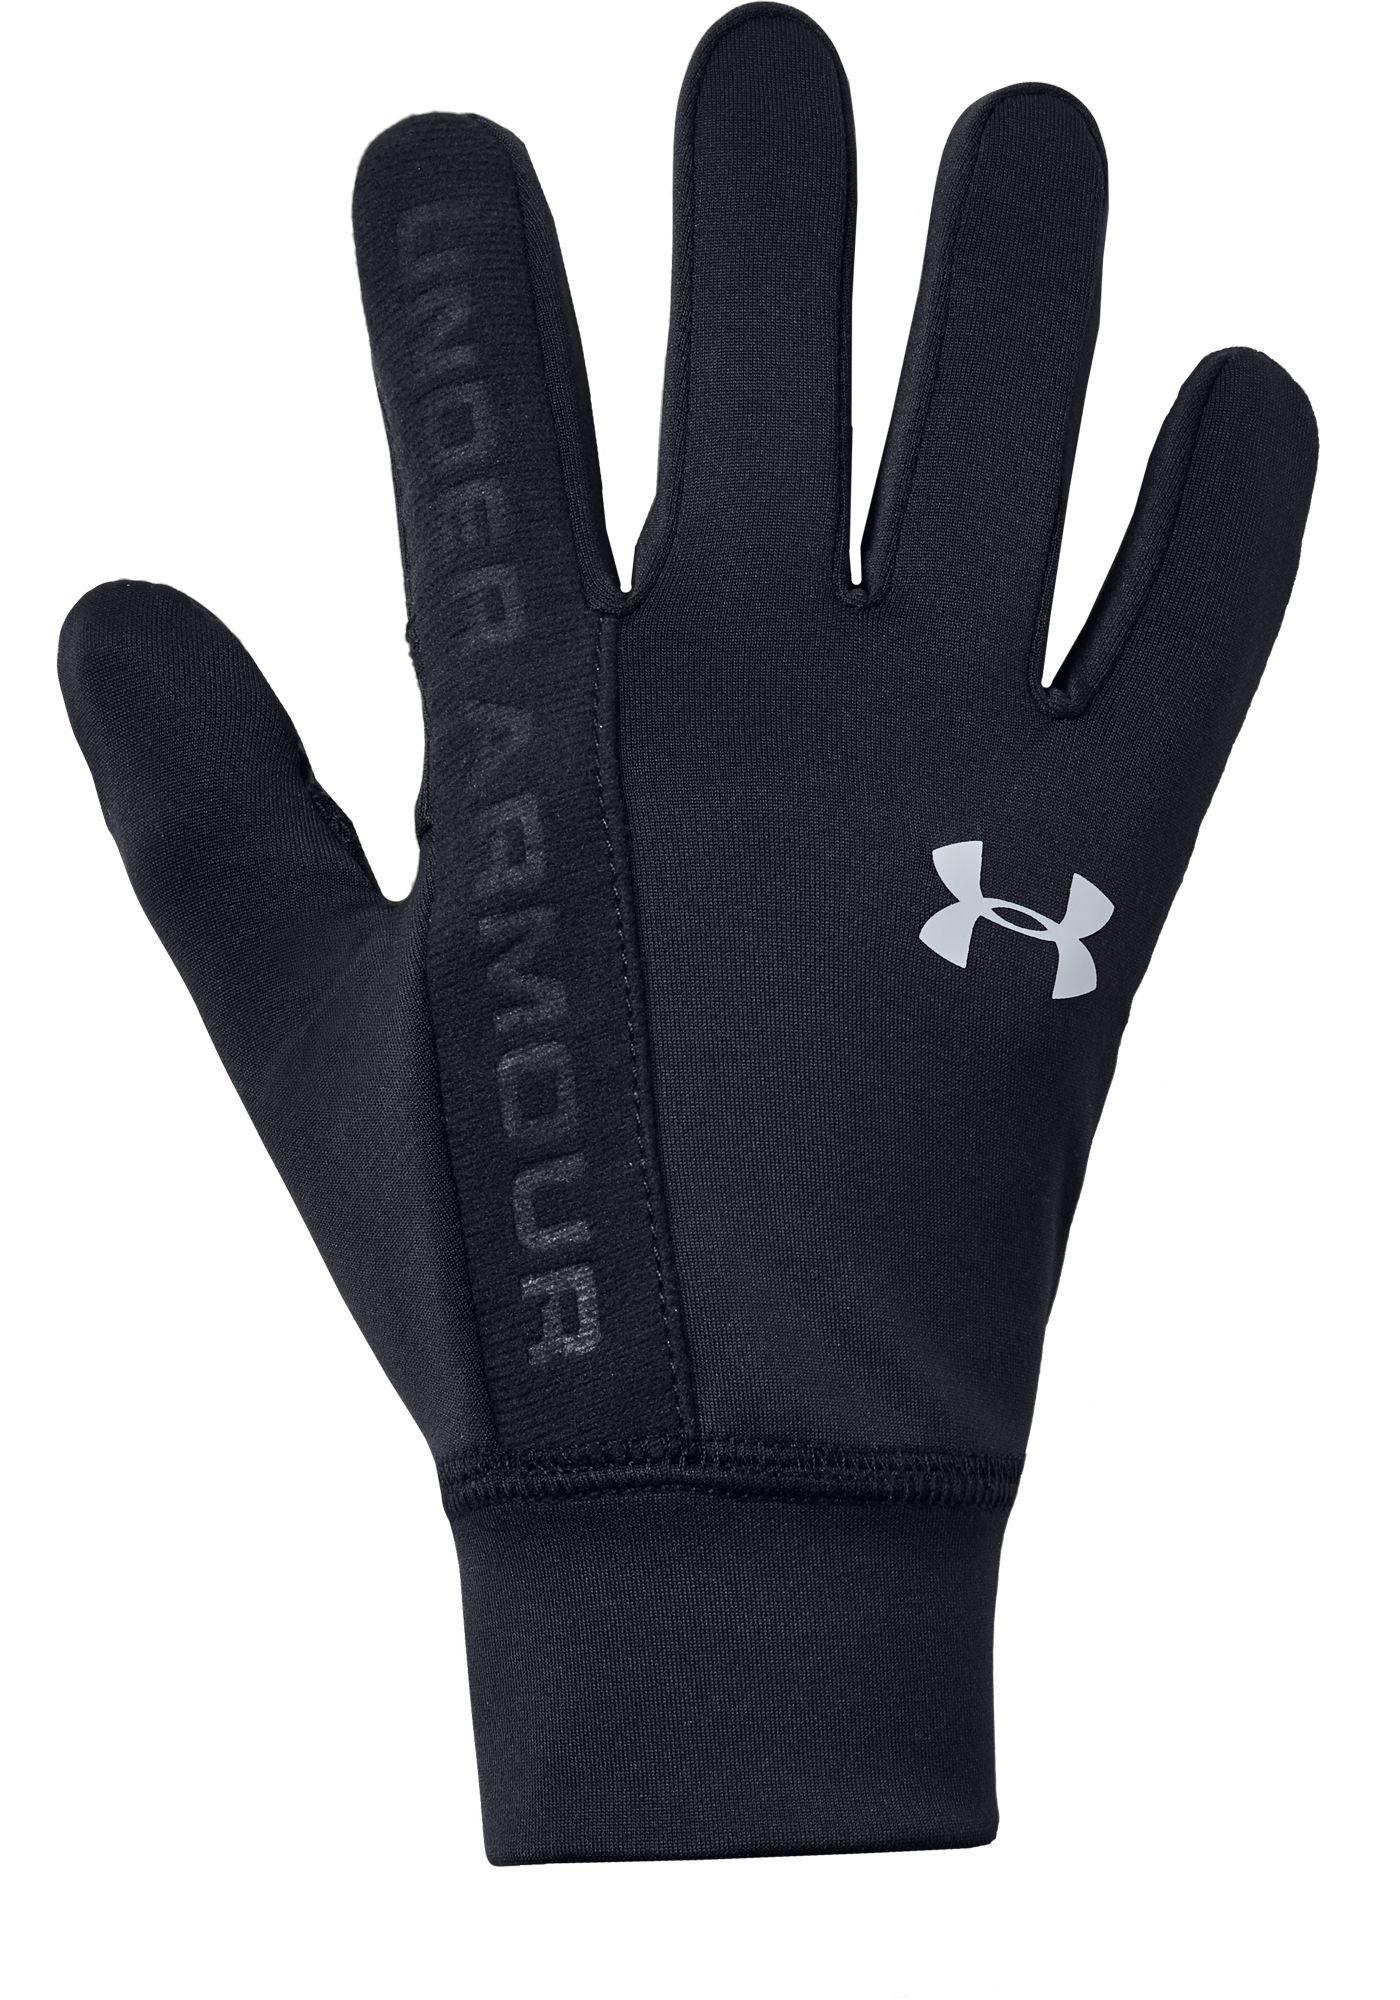 Under Armour Boy's Liner Gloves